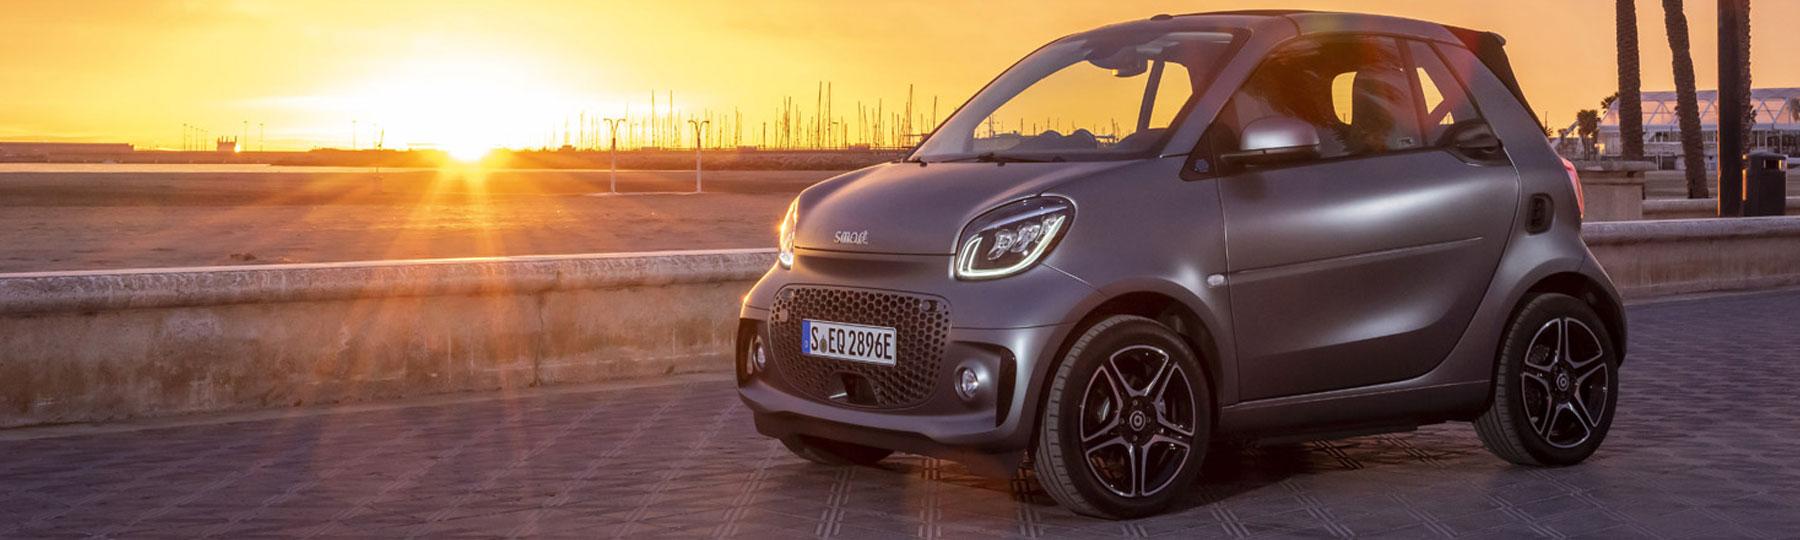 smart EQ fortwo cabrio New Car Offer